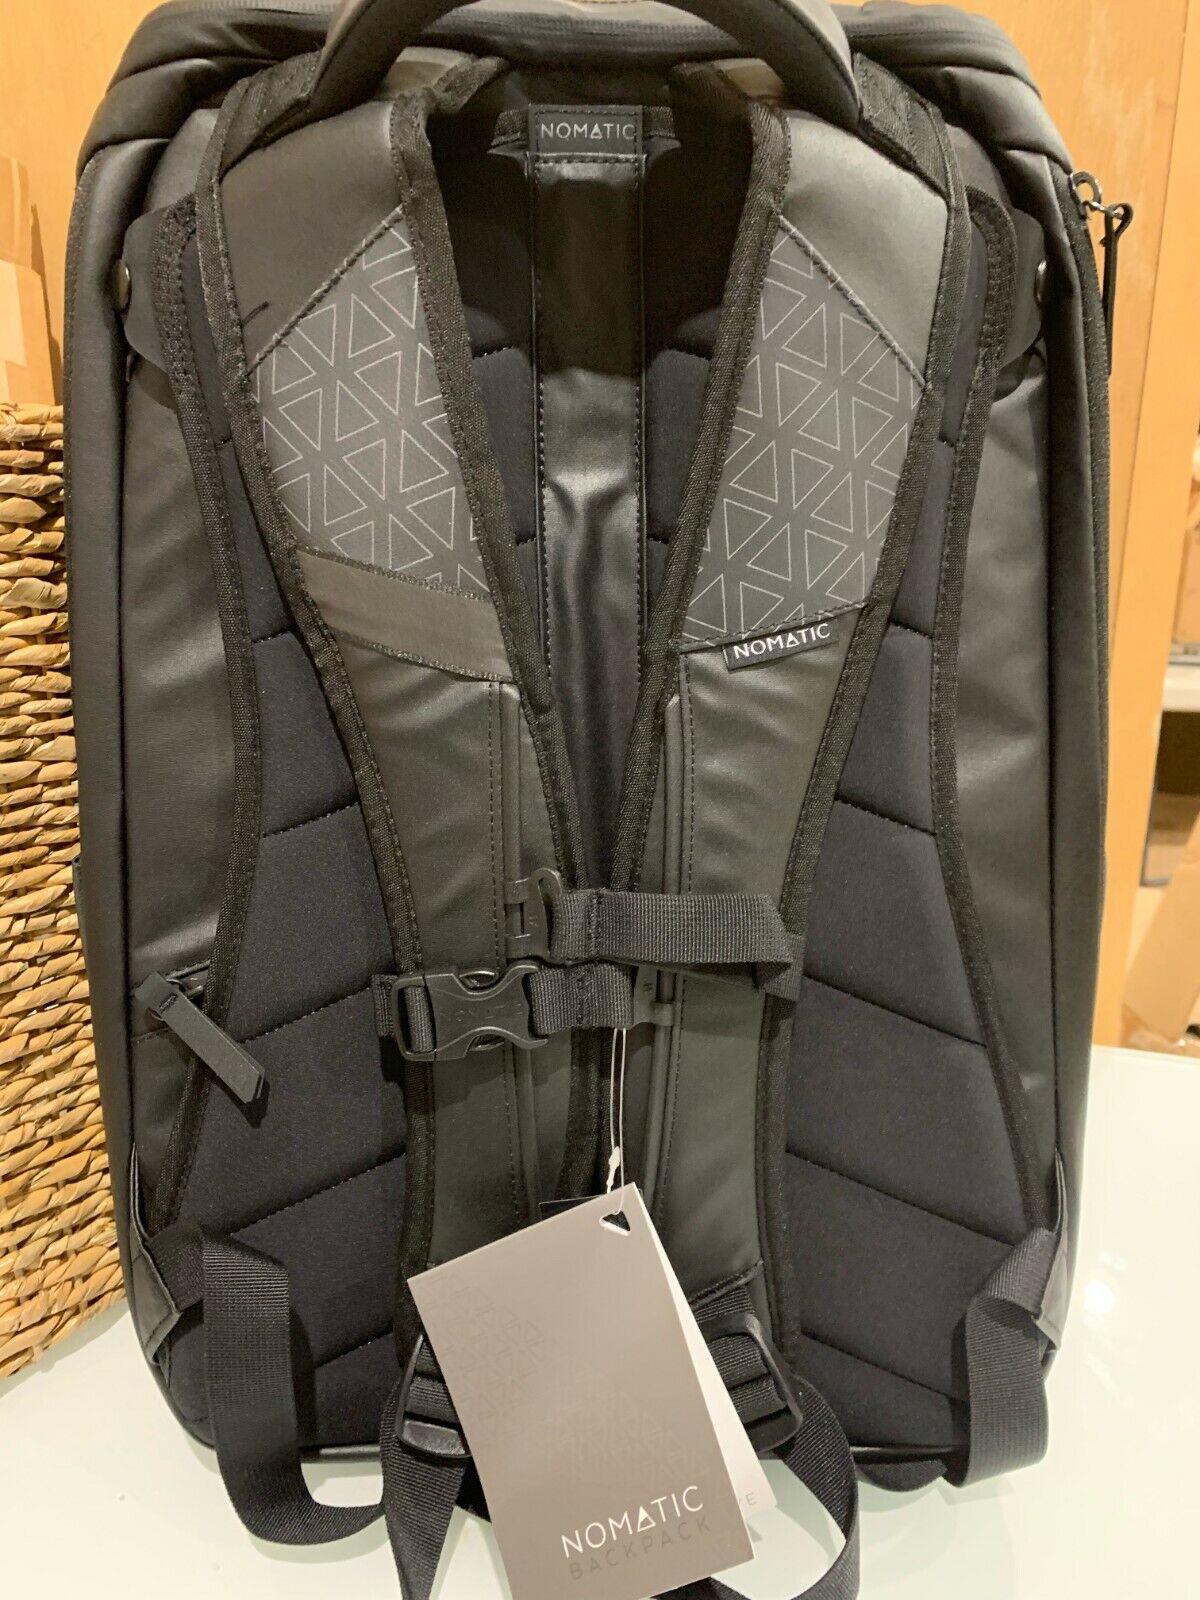 Nomatic Backpack - $200.00